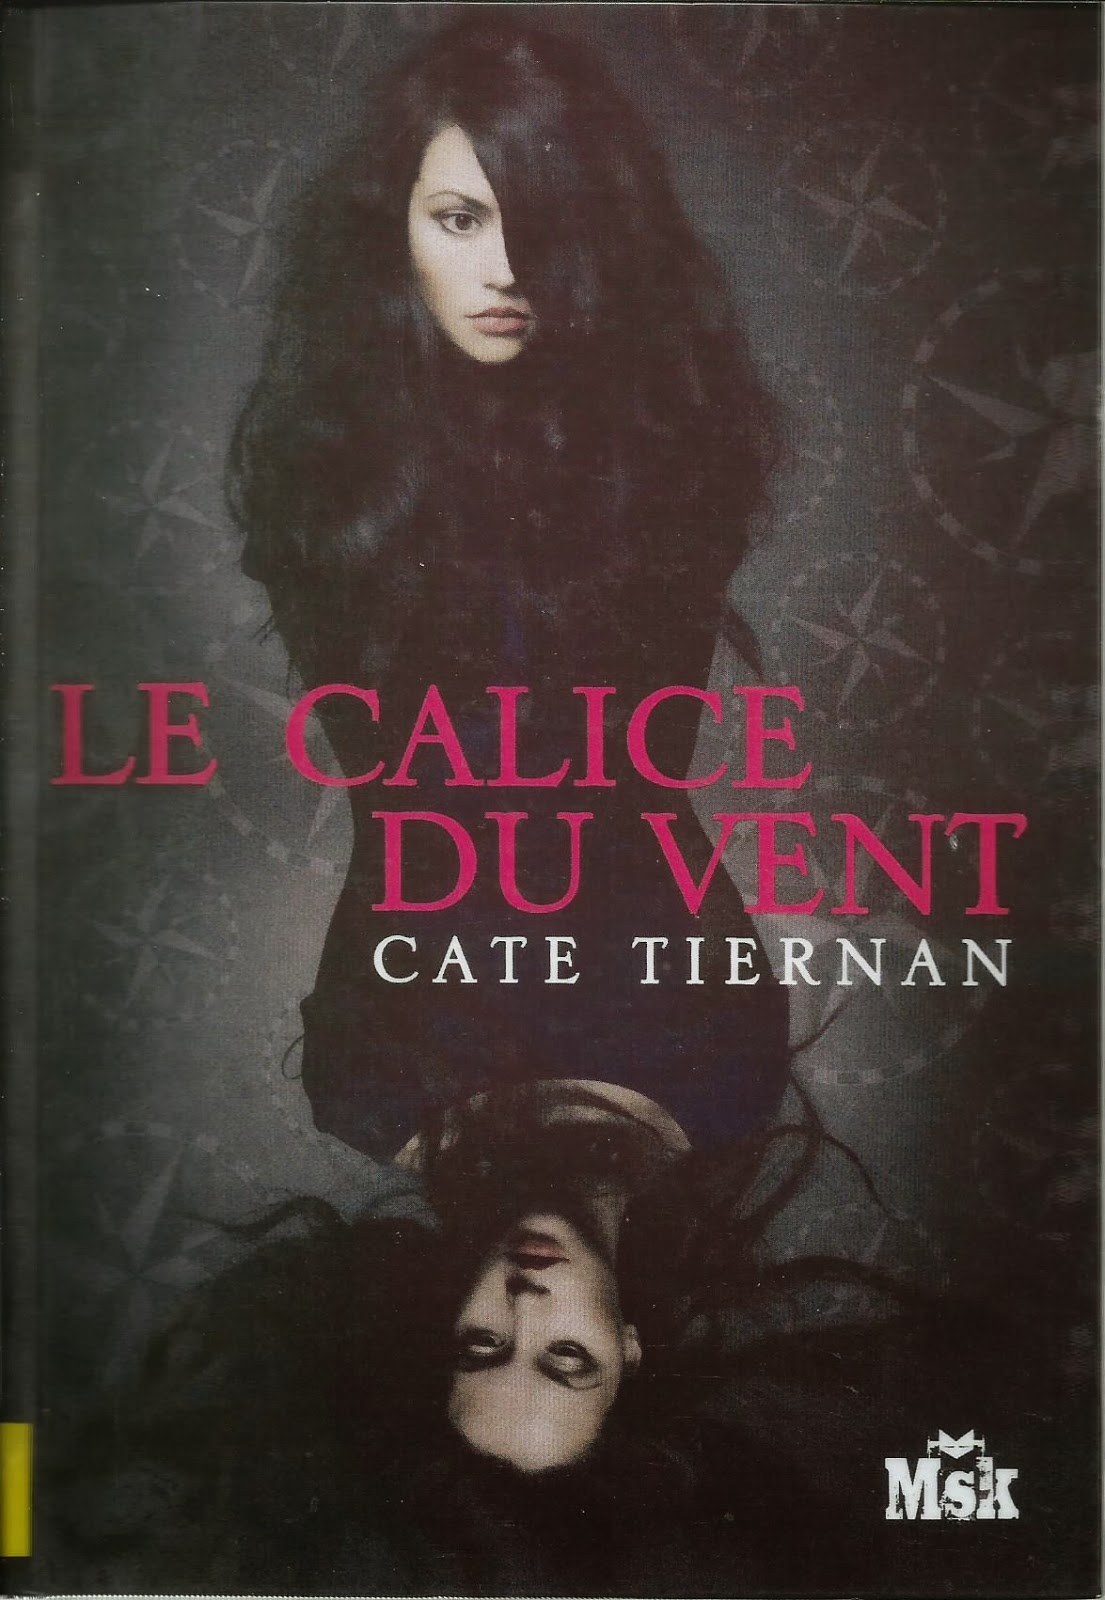 Balefire tome 1 : le calice du vent (Cate Tiernan)